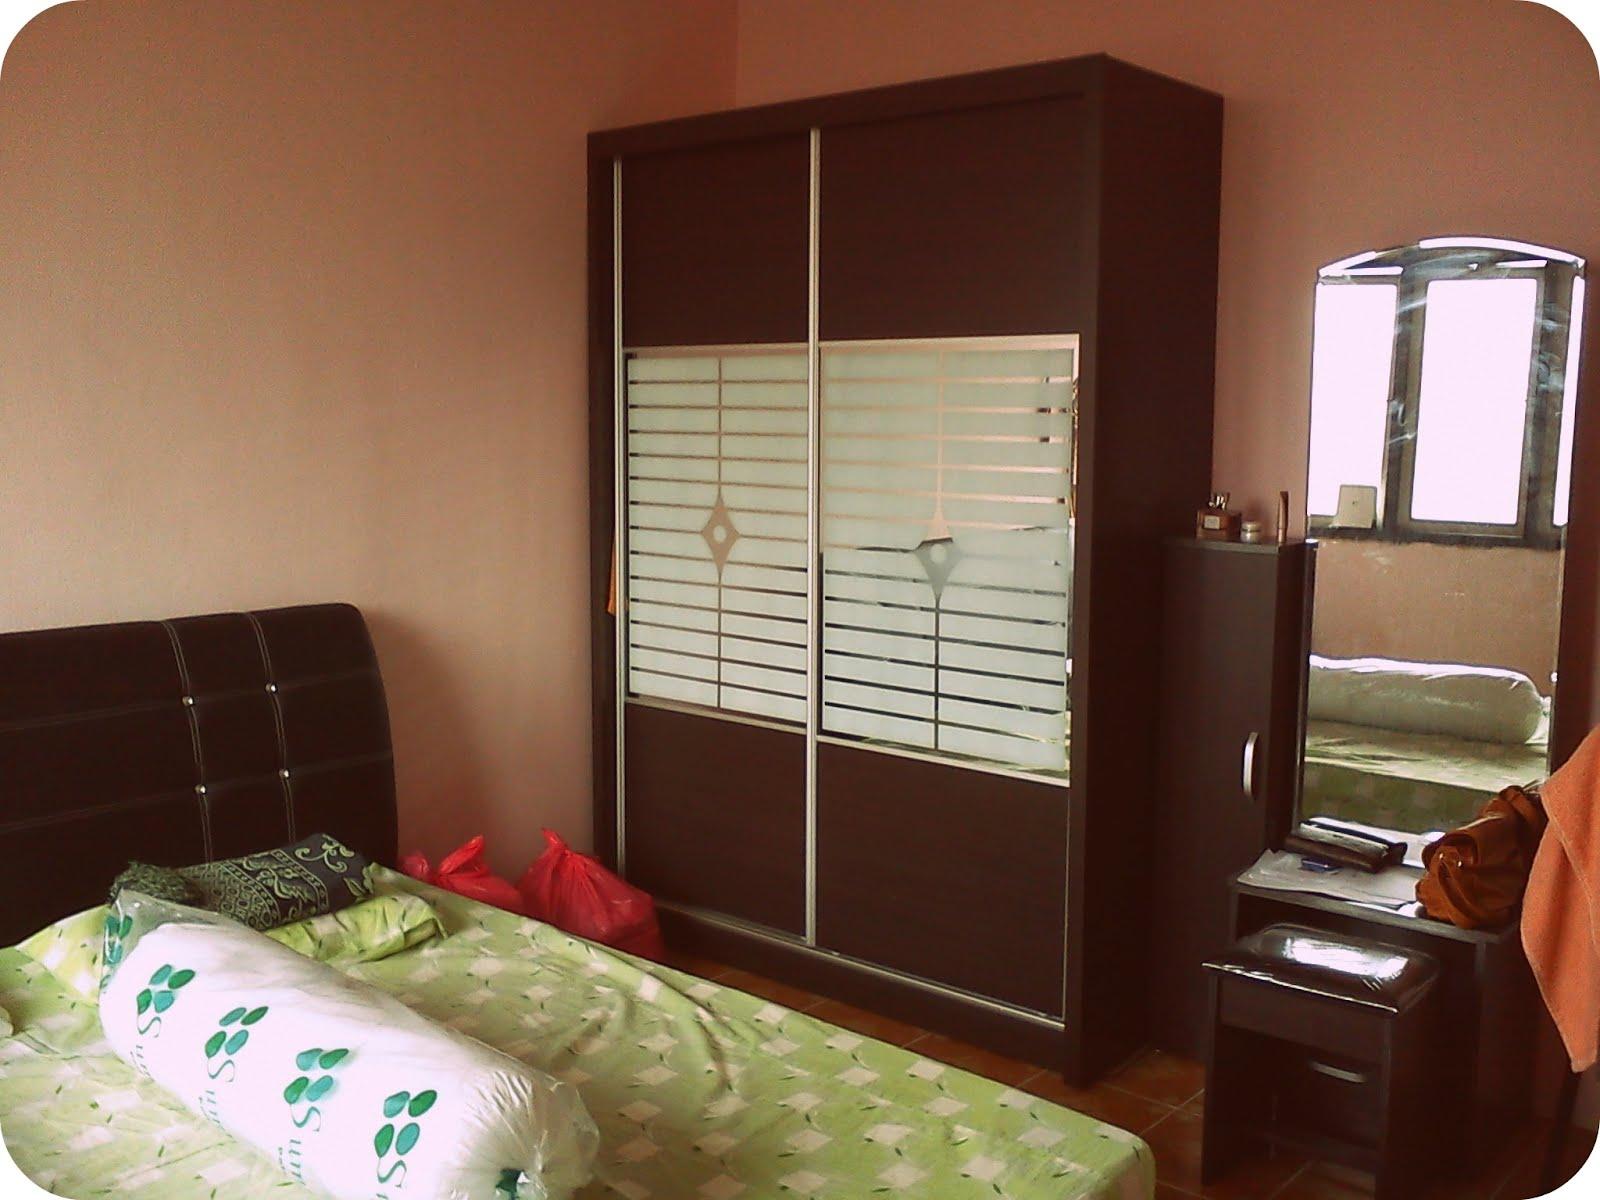 Bila Puan Amira Bercerita Set Katil Baru Utk Pengantin Bedroom Furniture Tidur Tilam Bilik